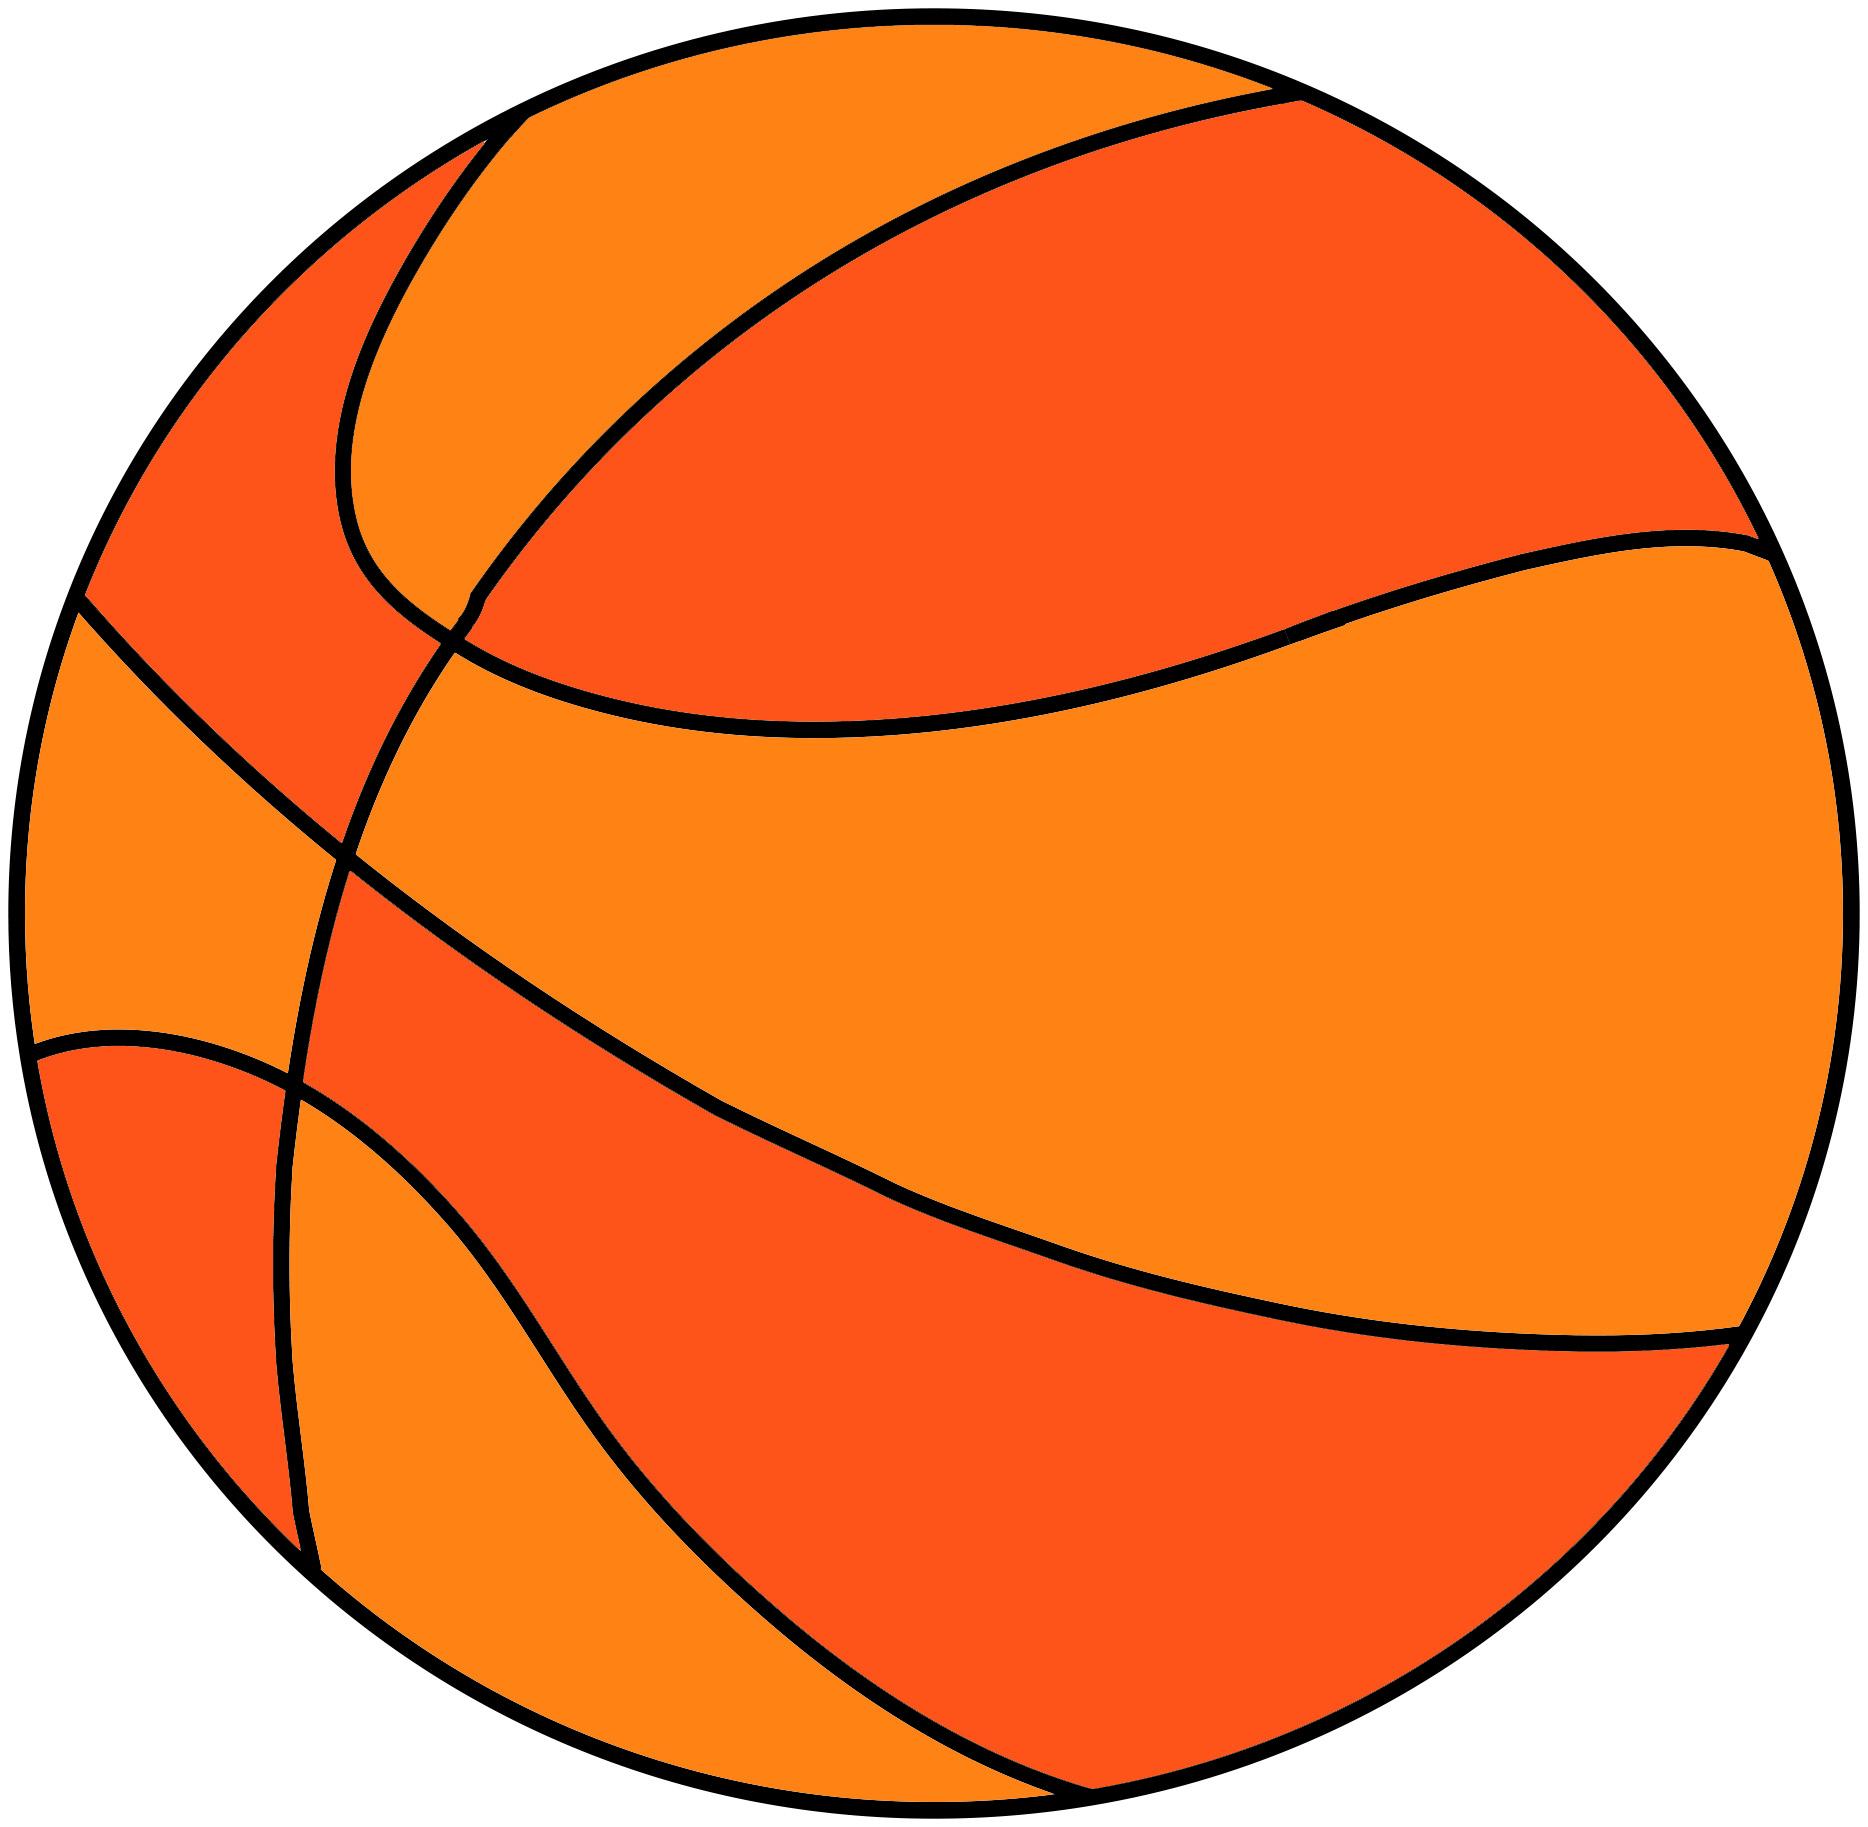 Balon De Baloncesto Dibujo Imagui